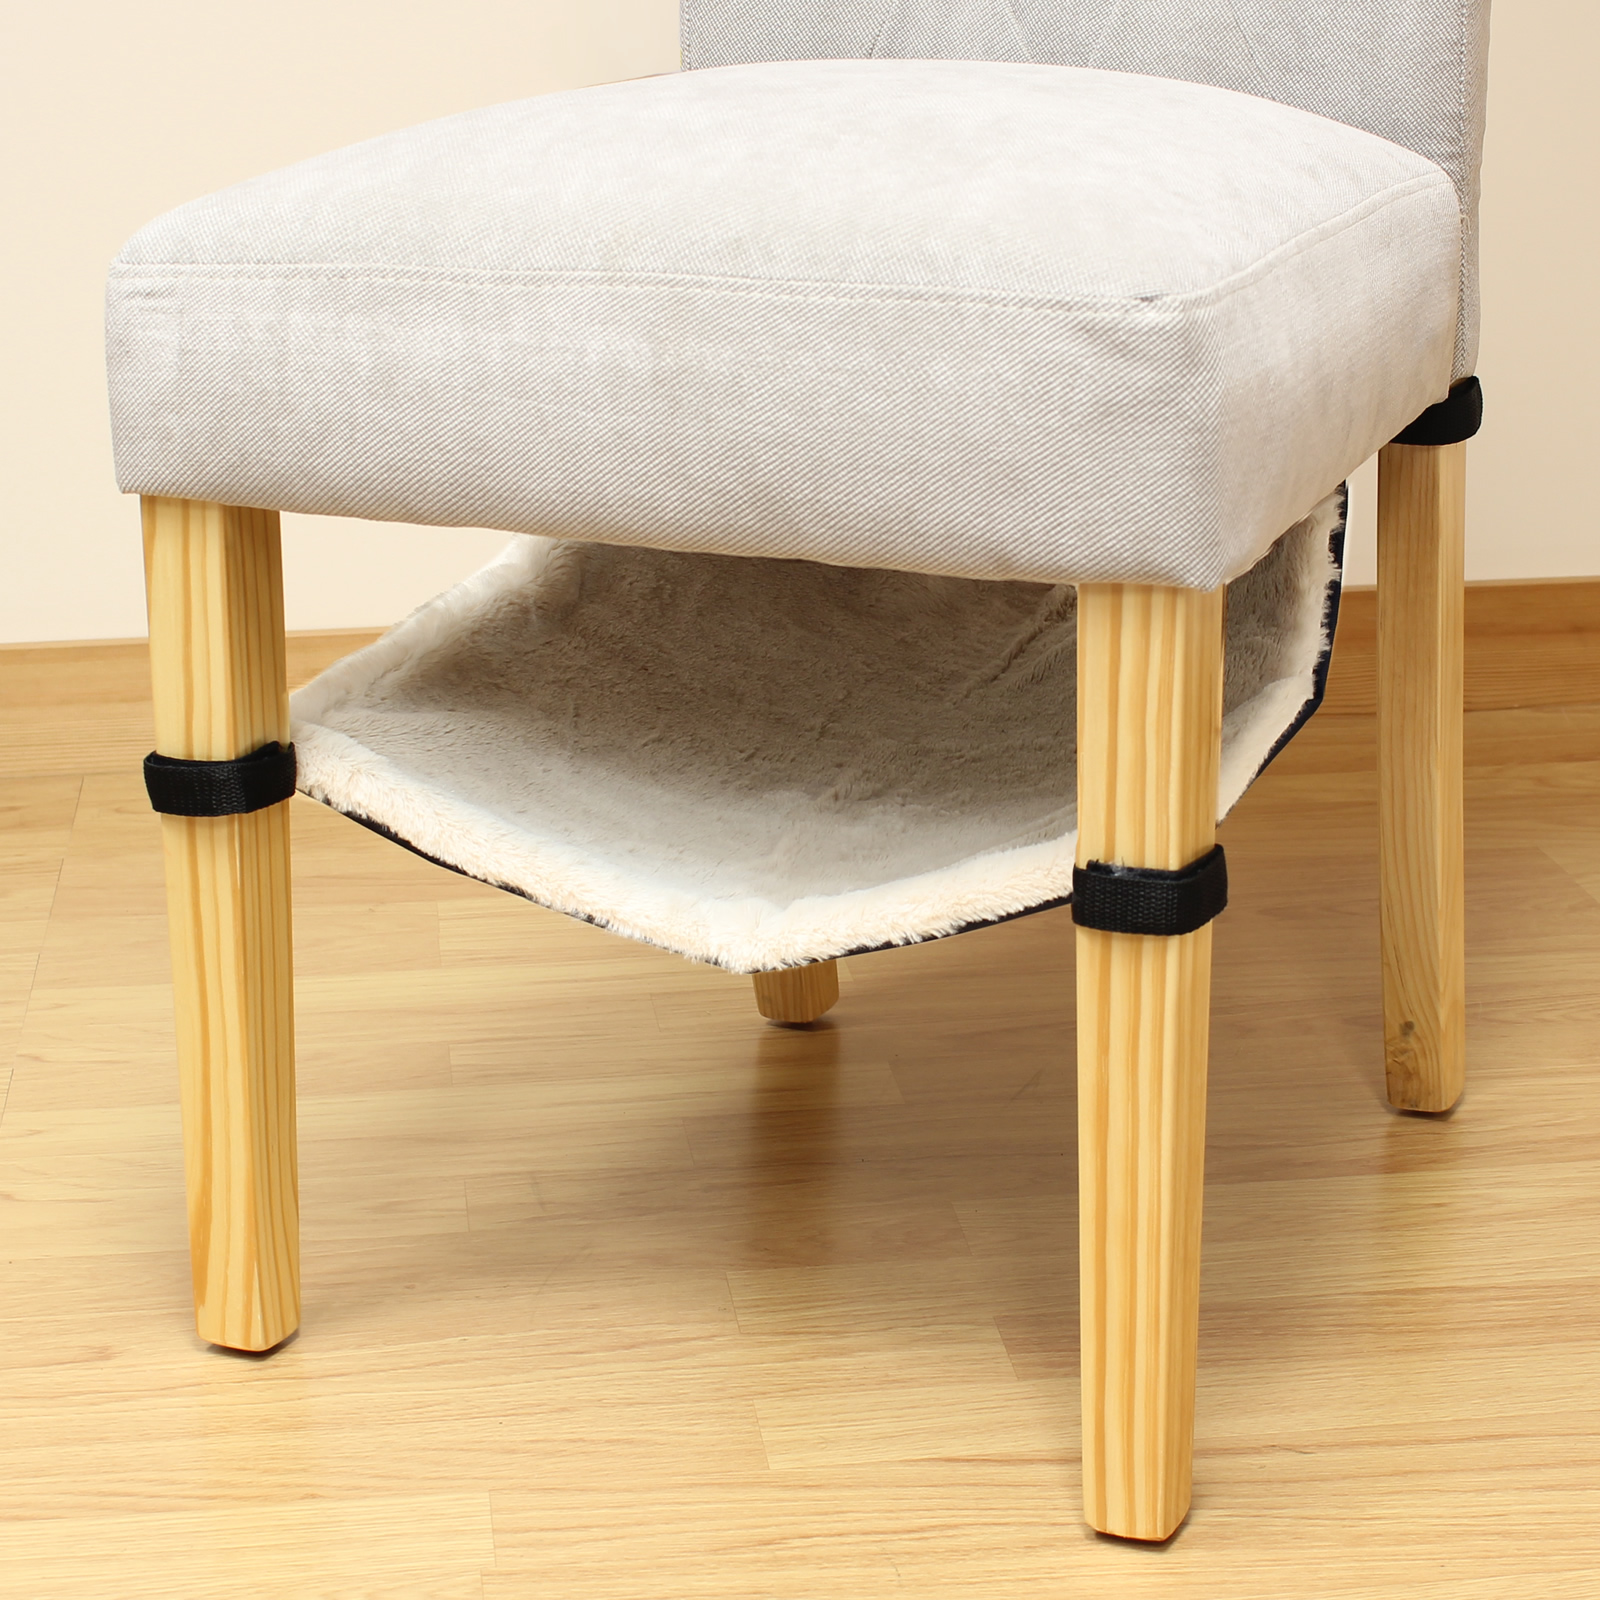 cat hammock under chair fancy folding chairs dining table leg hanging kitten